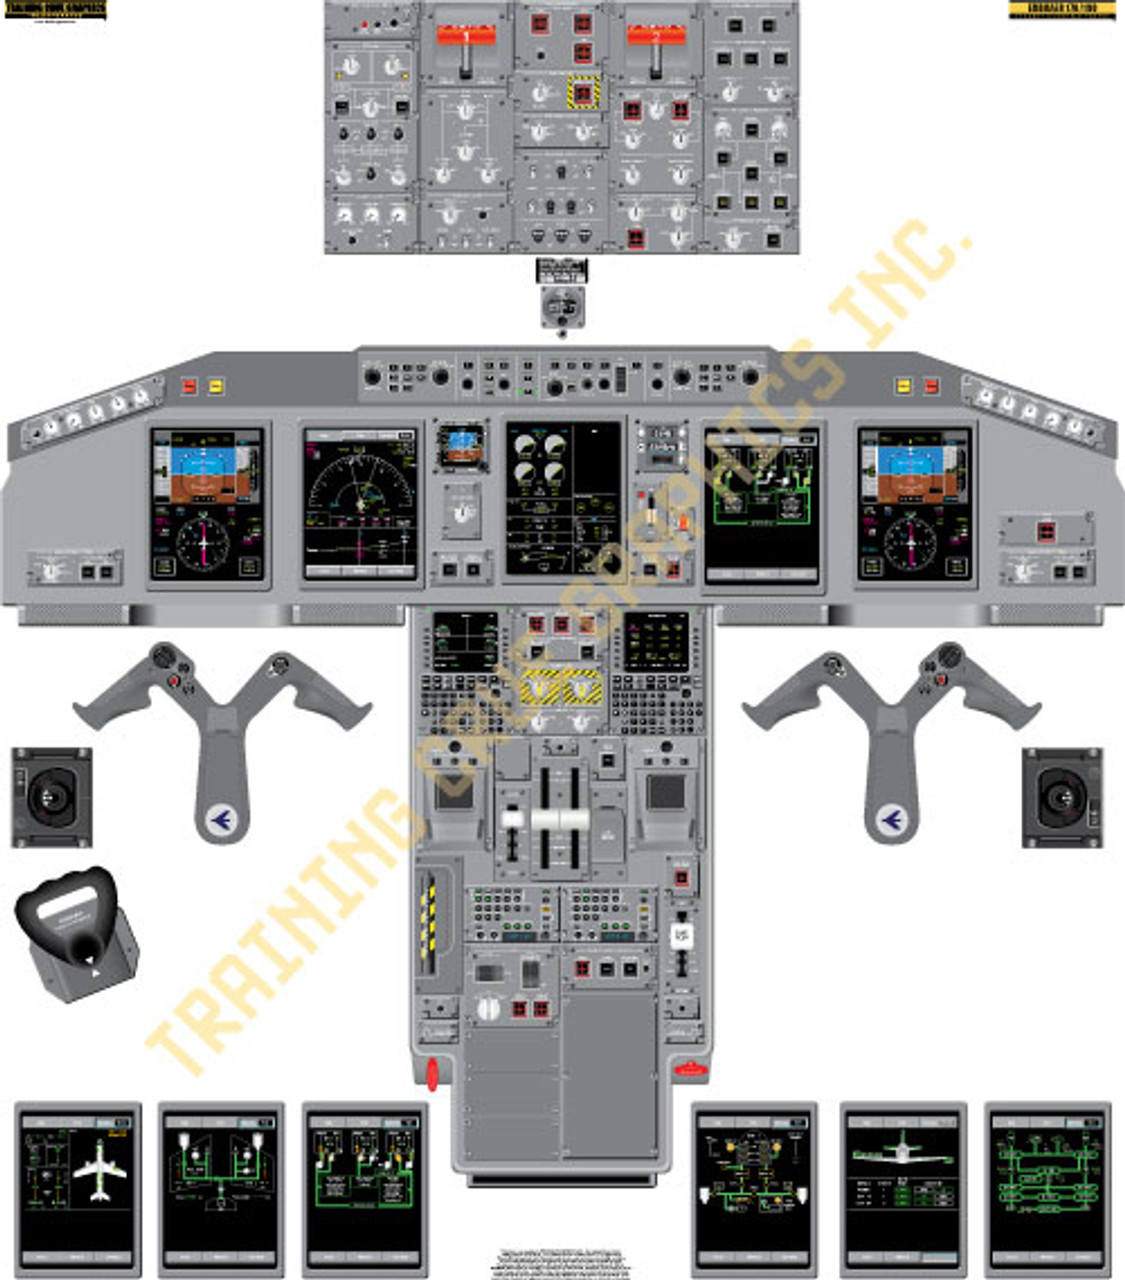 Embraer 170/190 Poster